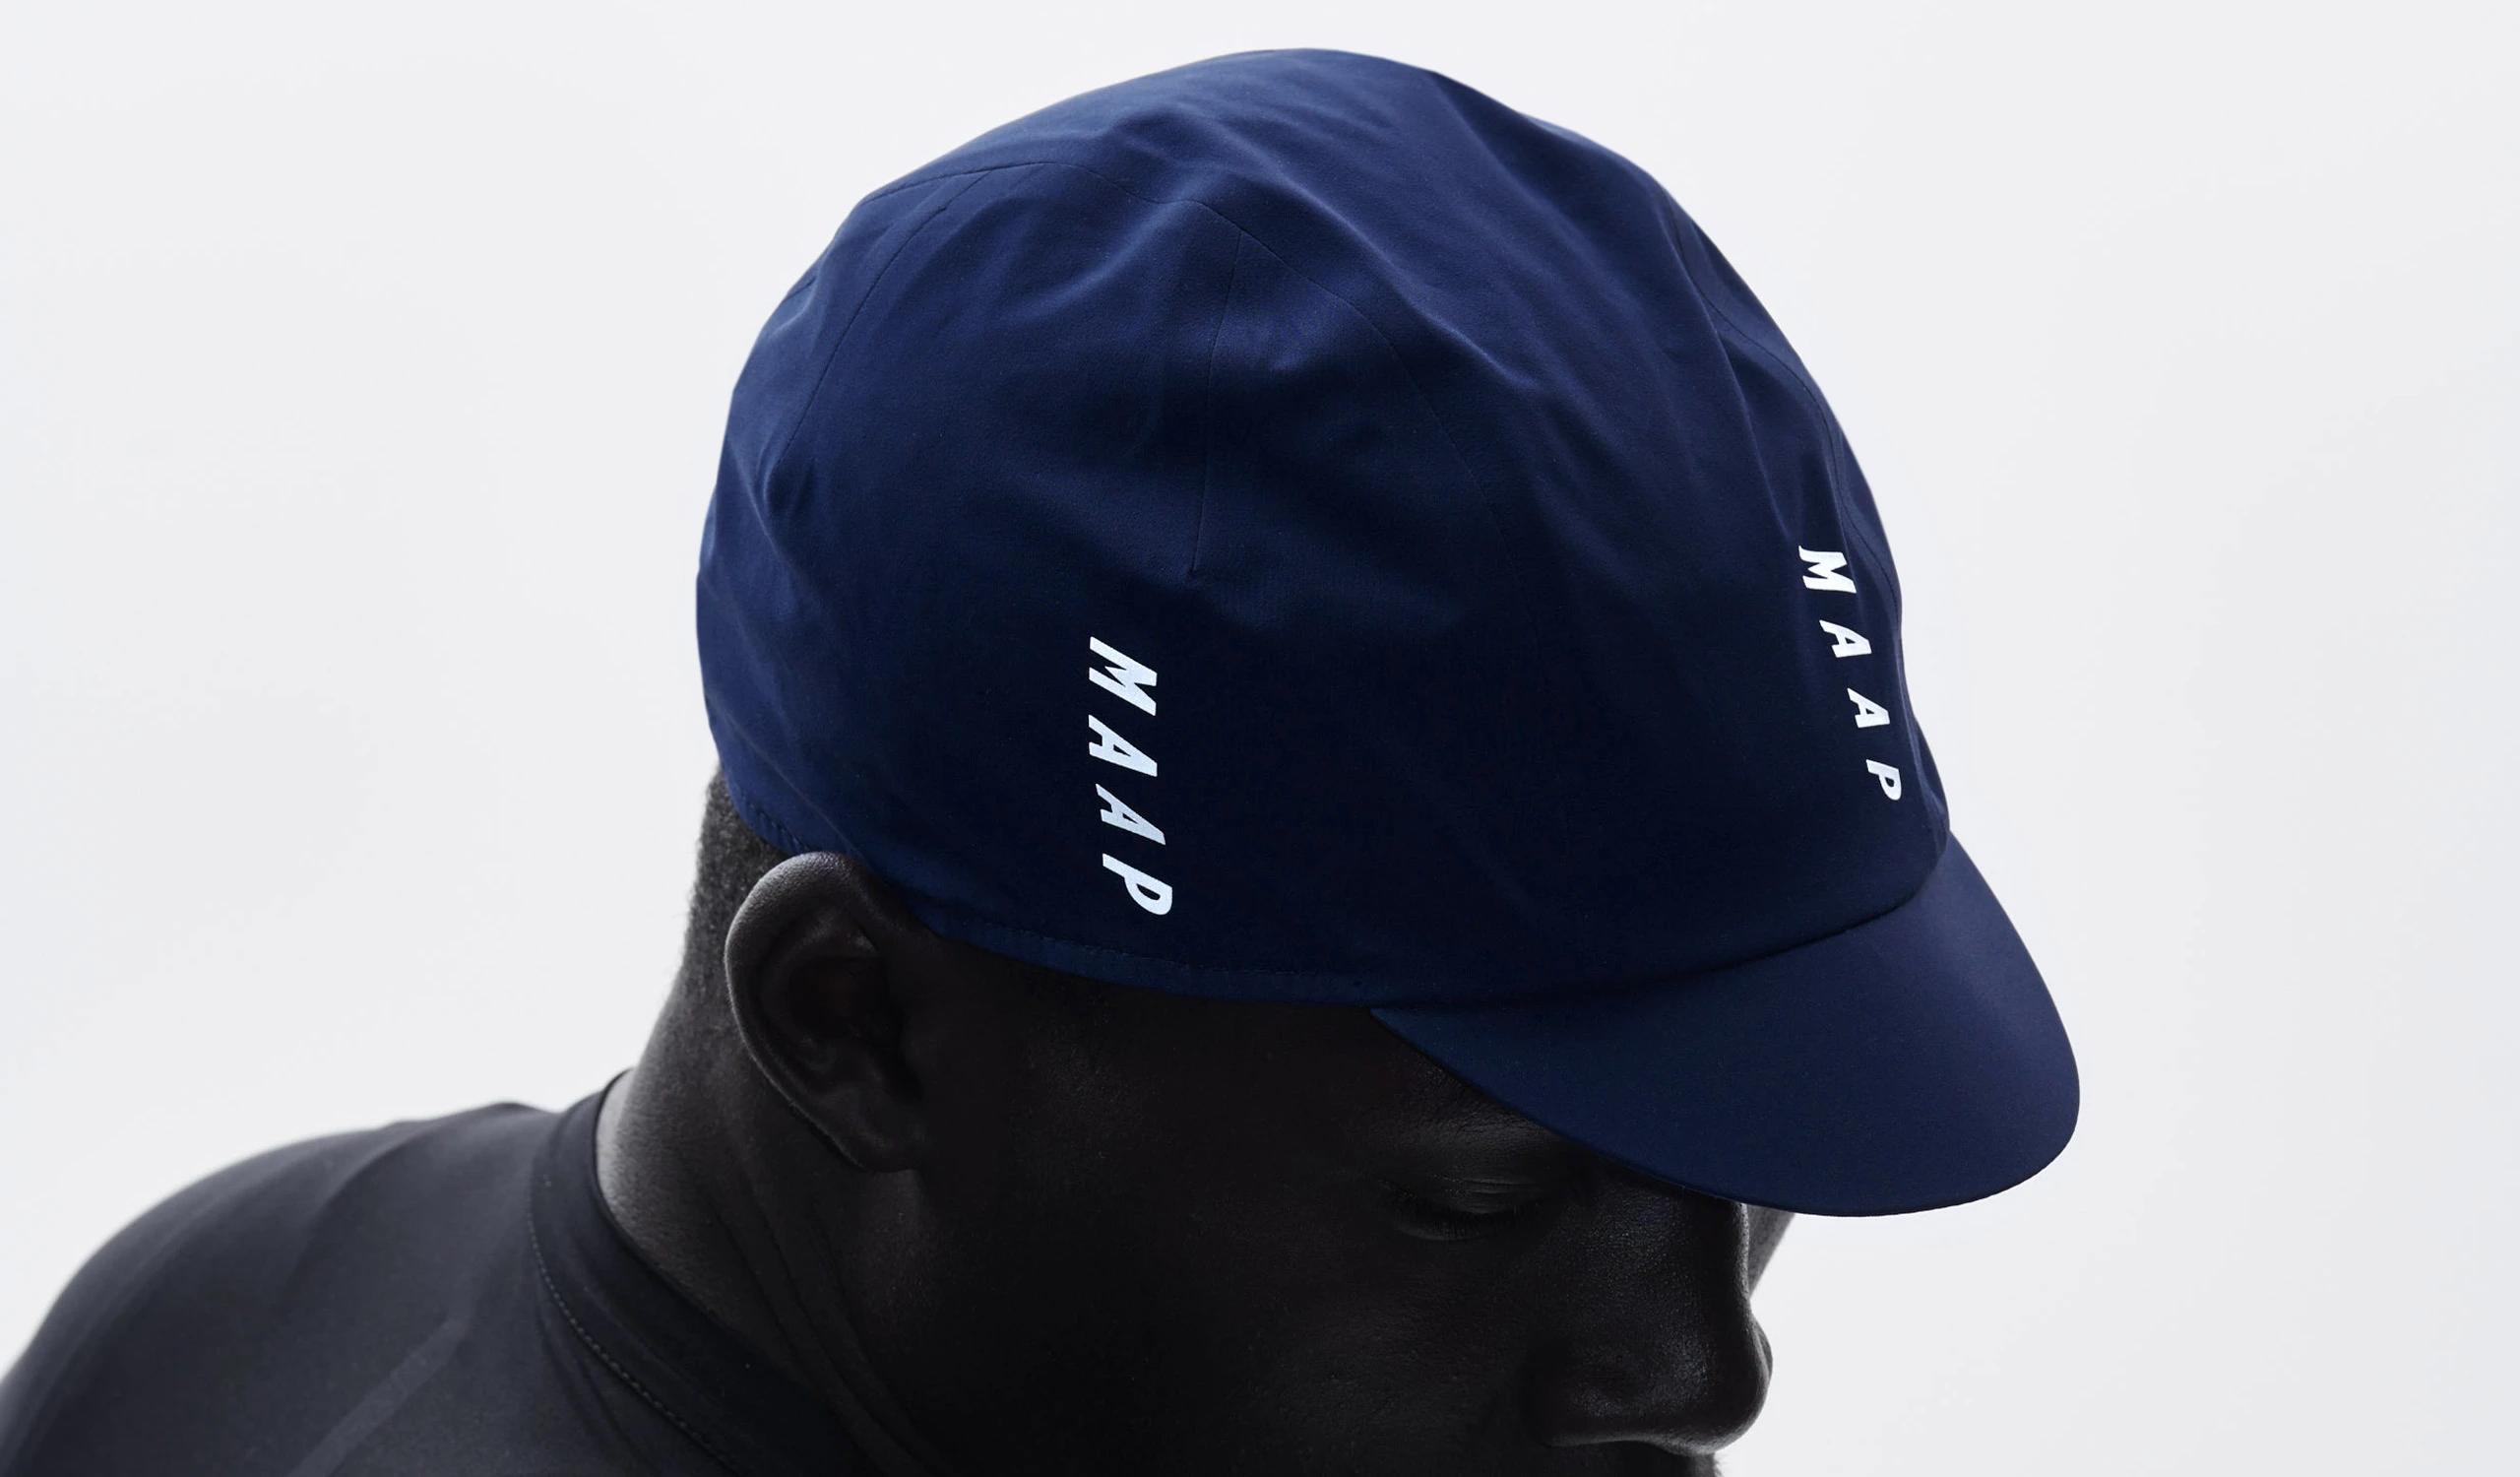 Prime New Era Cap / Navy